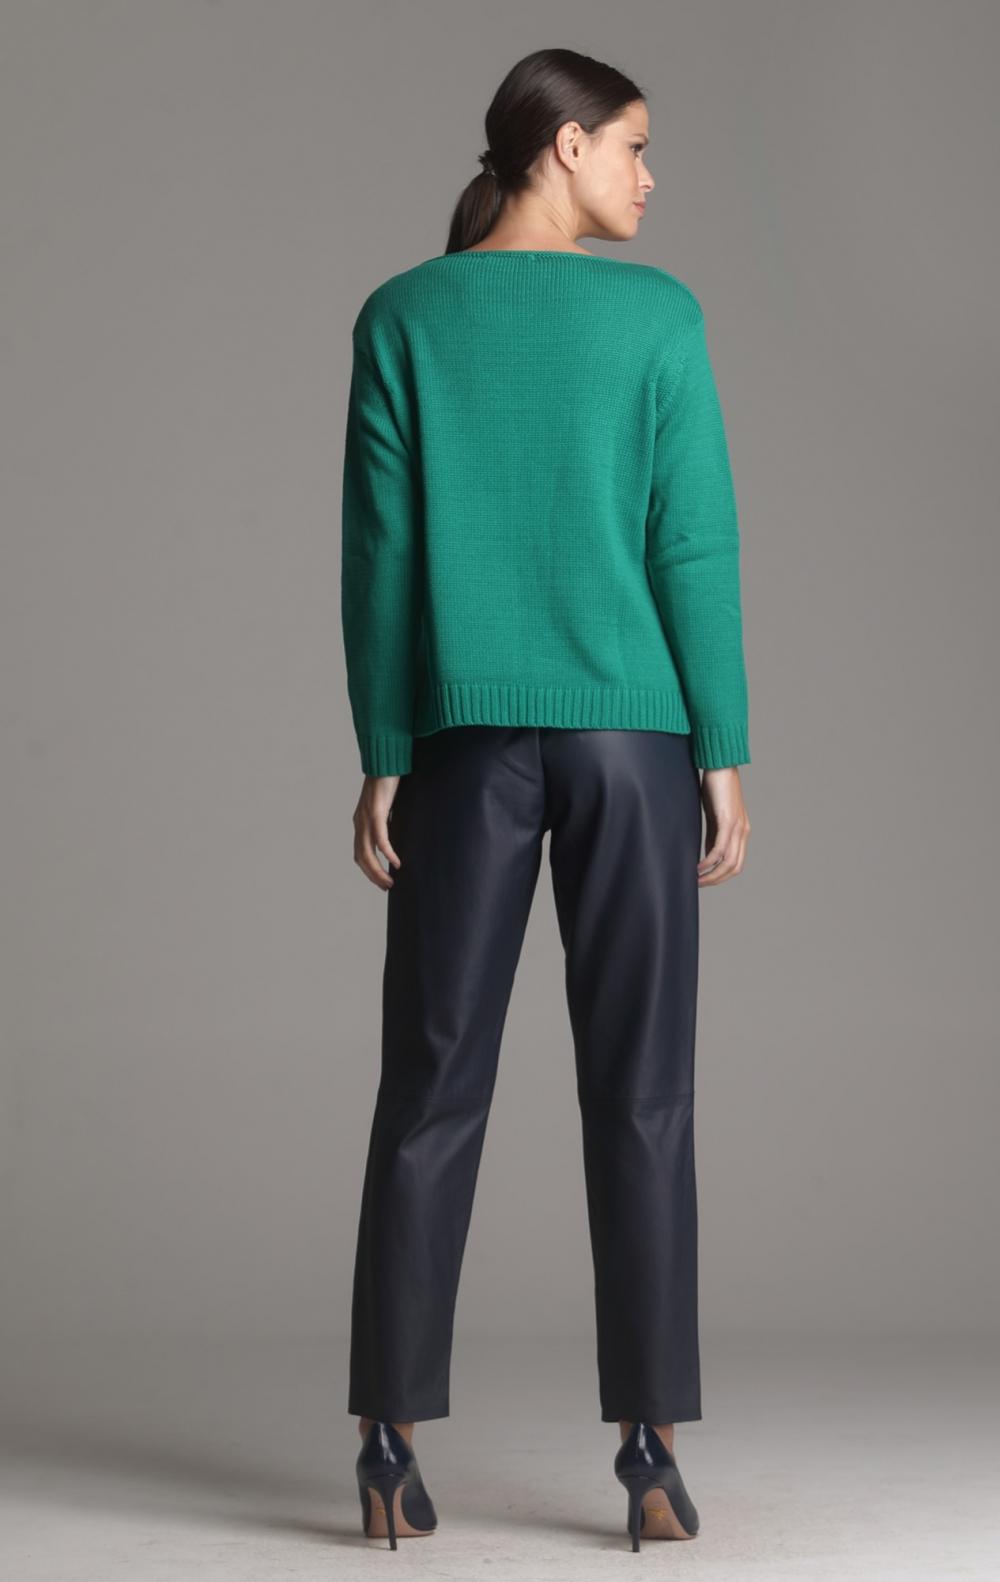 Blusa Tricot Tania Verde  - Foto 2